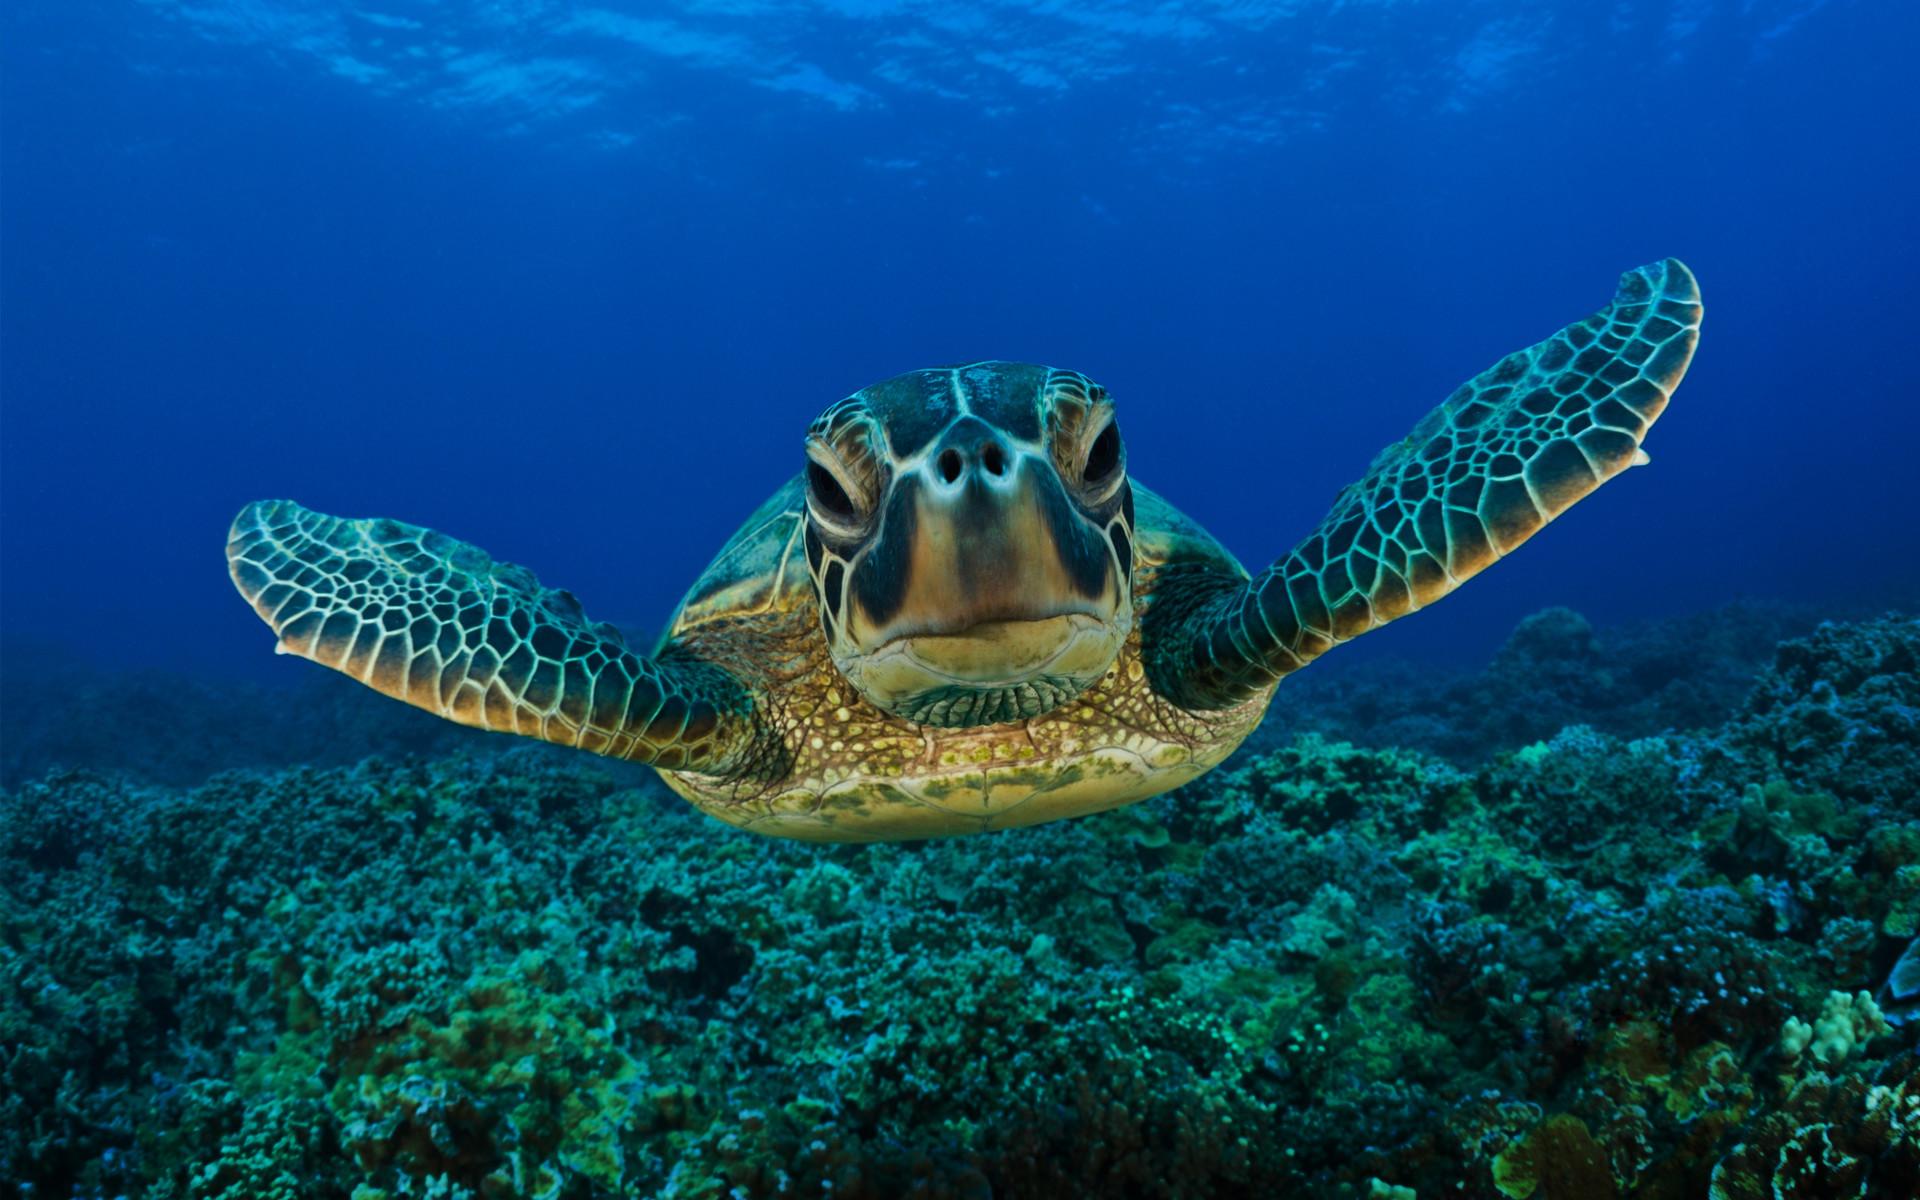 Hd wallpaper underwater - Underwater Turtle Hd Wallpaper 1920 1200 20819 Hd Wallpaper Res